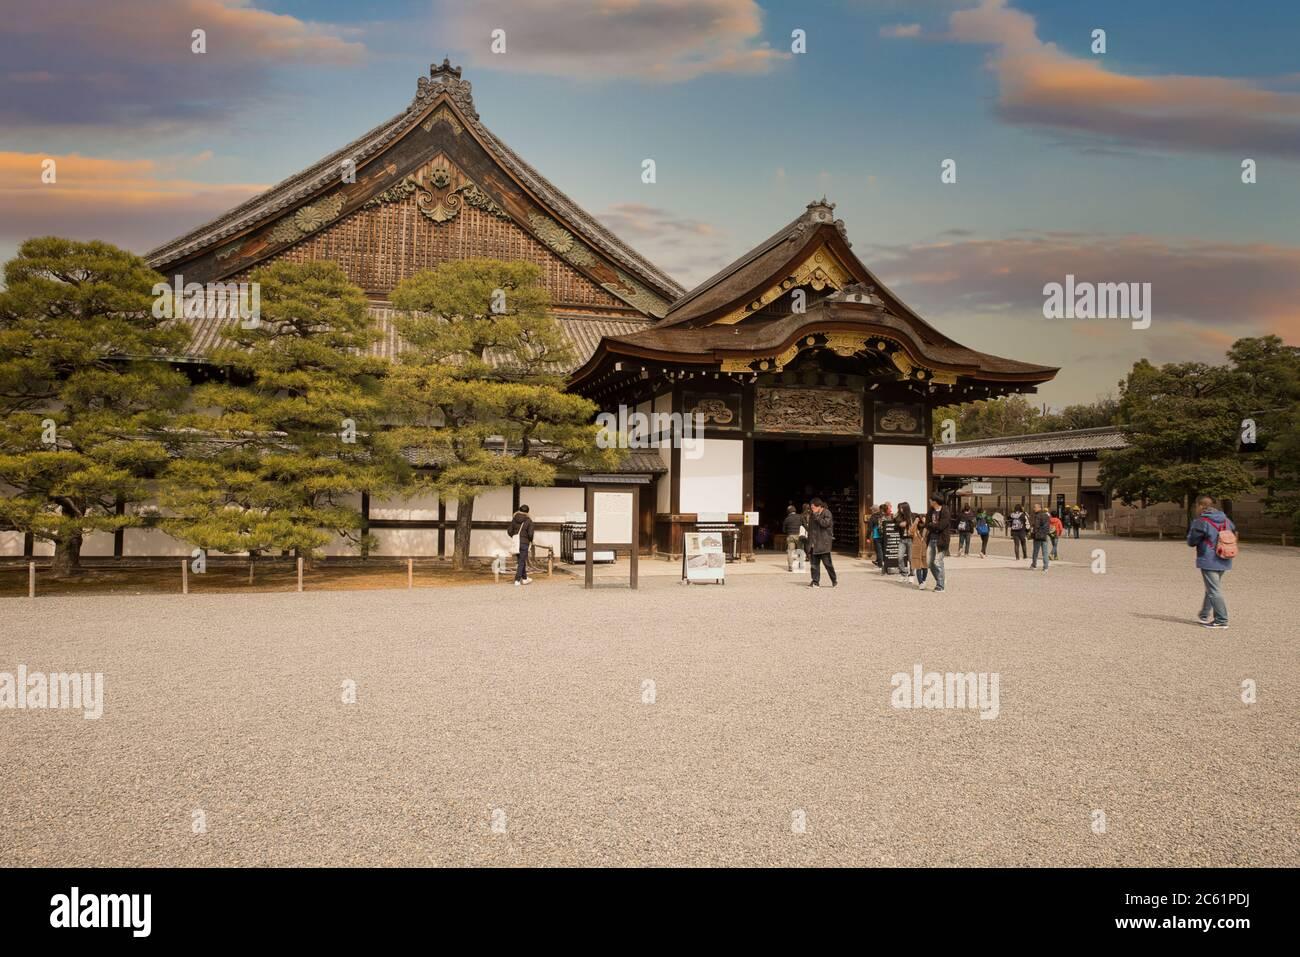 Niroshima und Honmaru Paläste in japan Stockfoto